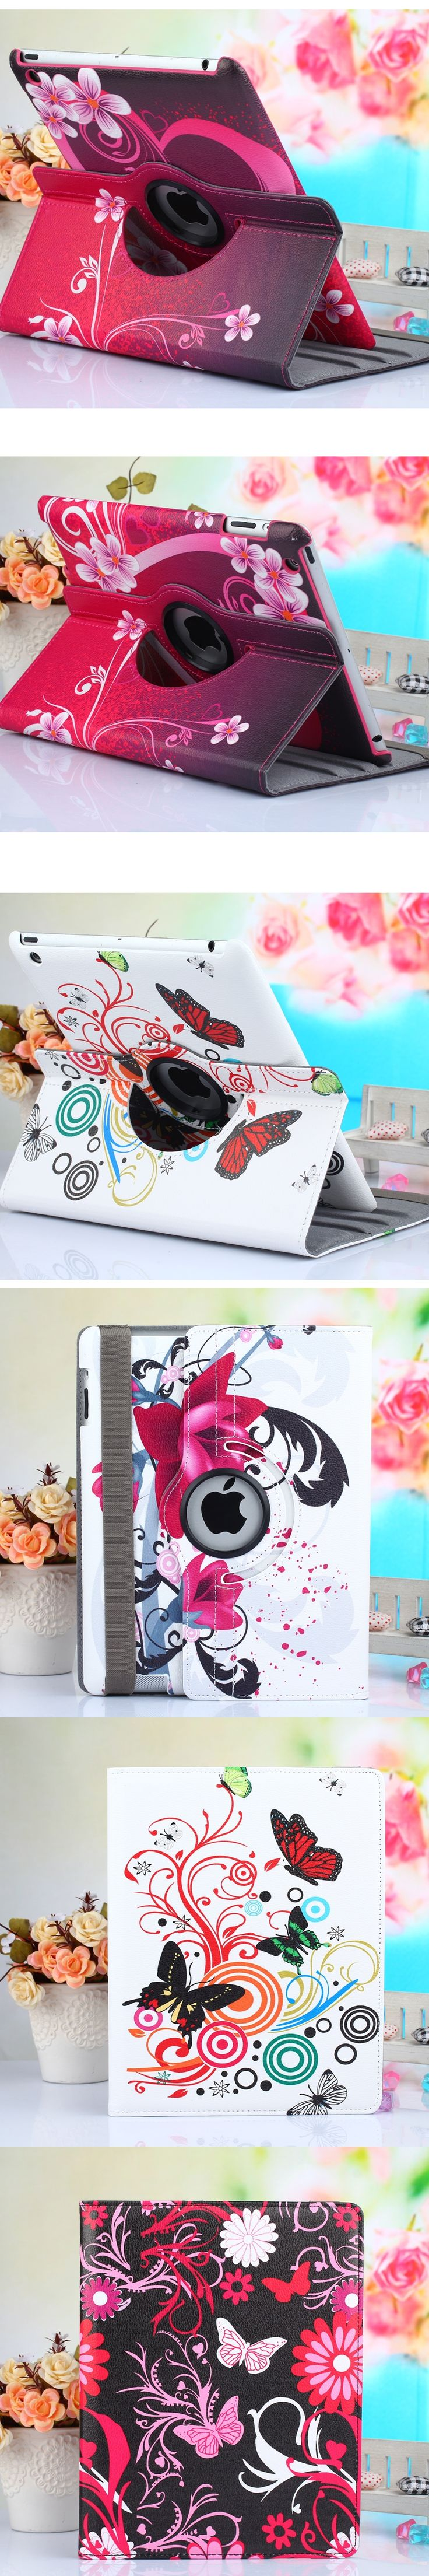 360 Rotation Print Tablet Case For iPad 6 Air 2 For iPad 5 Air 1 Auto Sleep Cover For iPad 234 Protective Shell For iPad 4 3 2